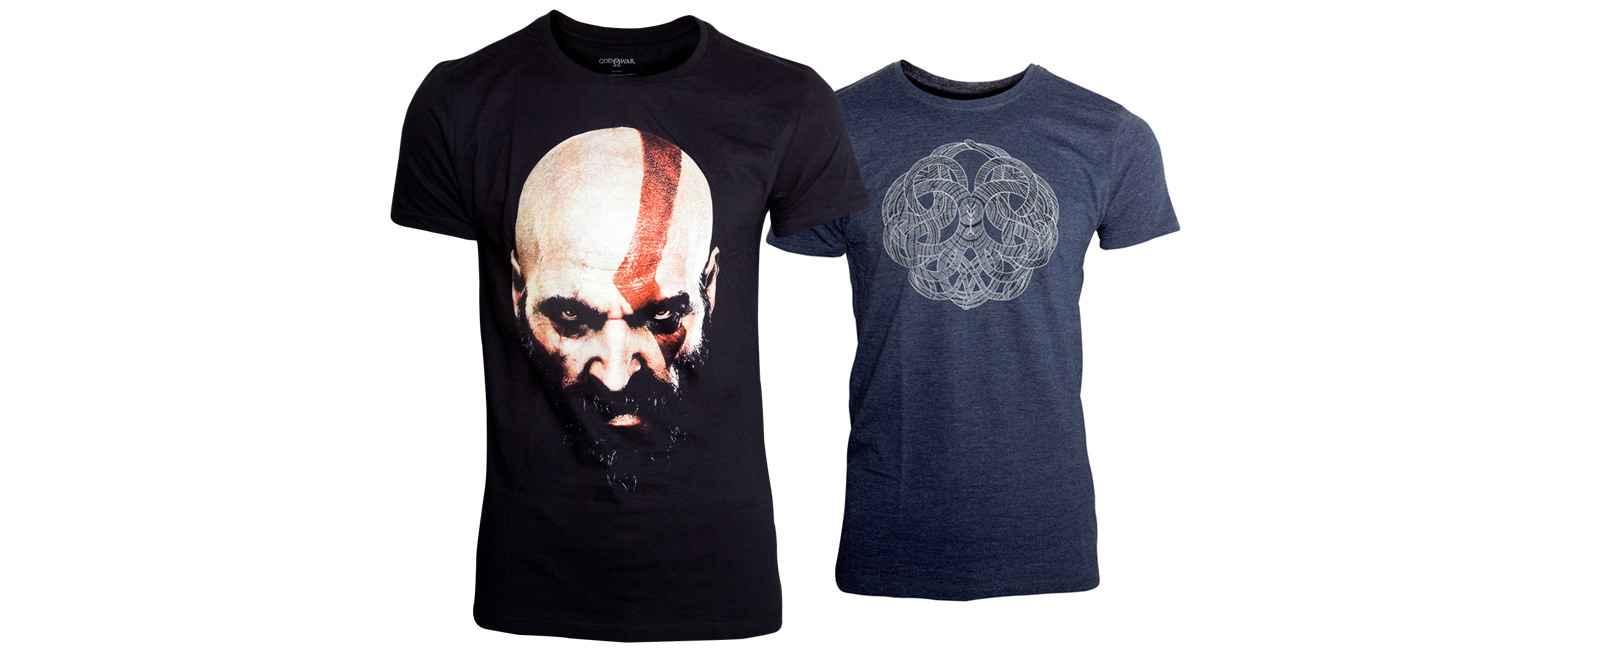 god of war t-shirts